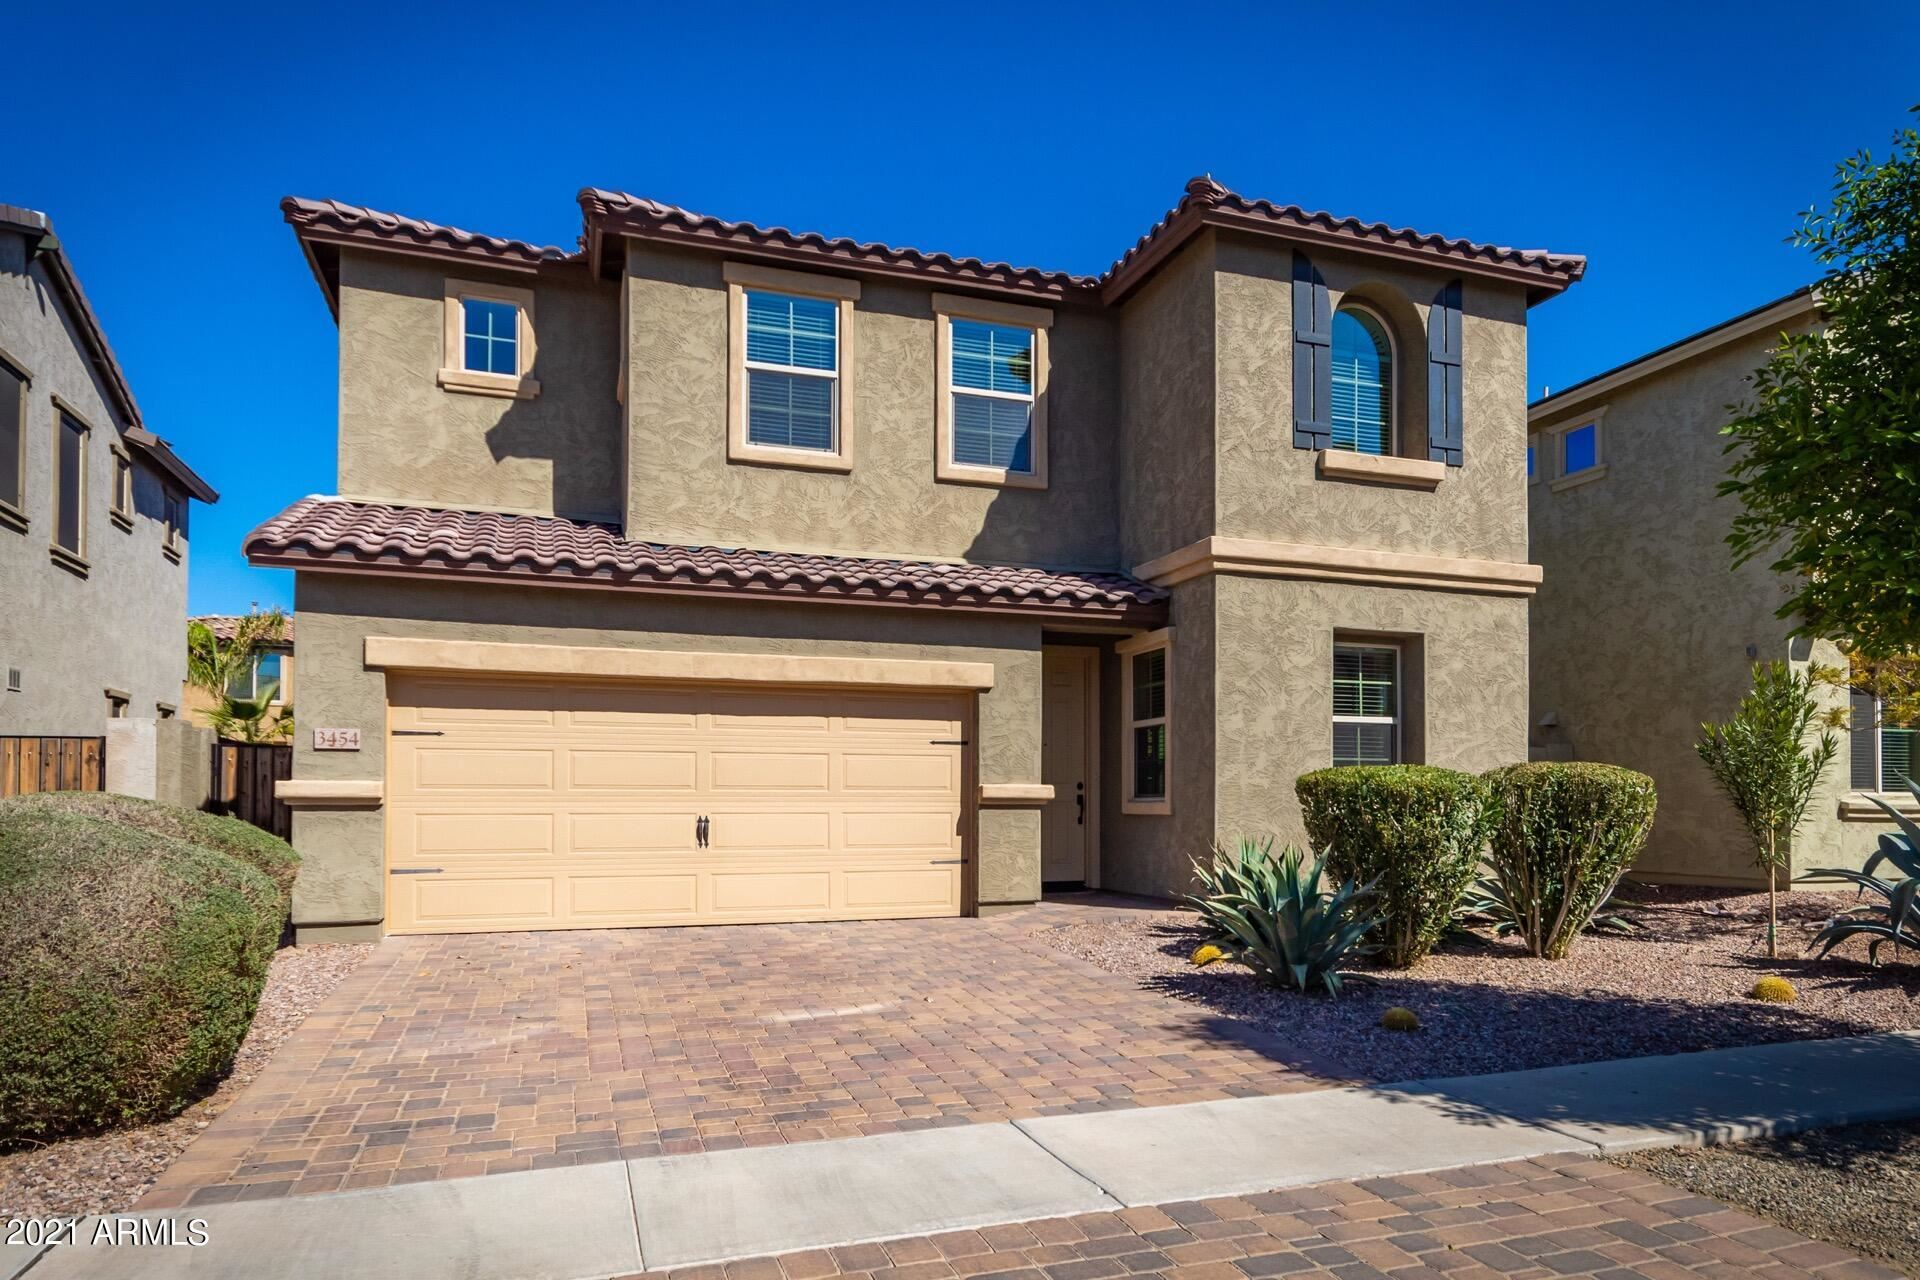 Photo of 3454 E AZALEA Drive, Gilbert, AZ 85298 (MLS # 6202322)